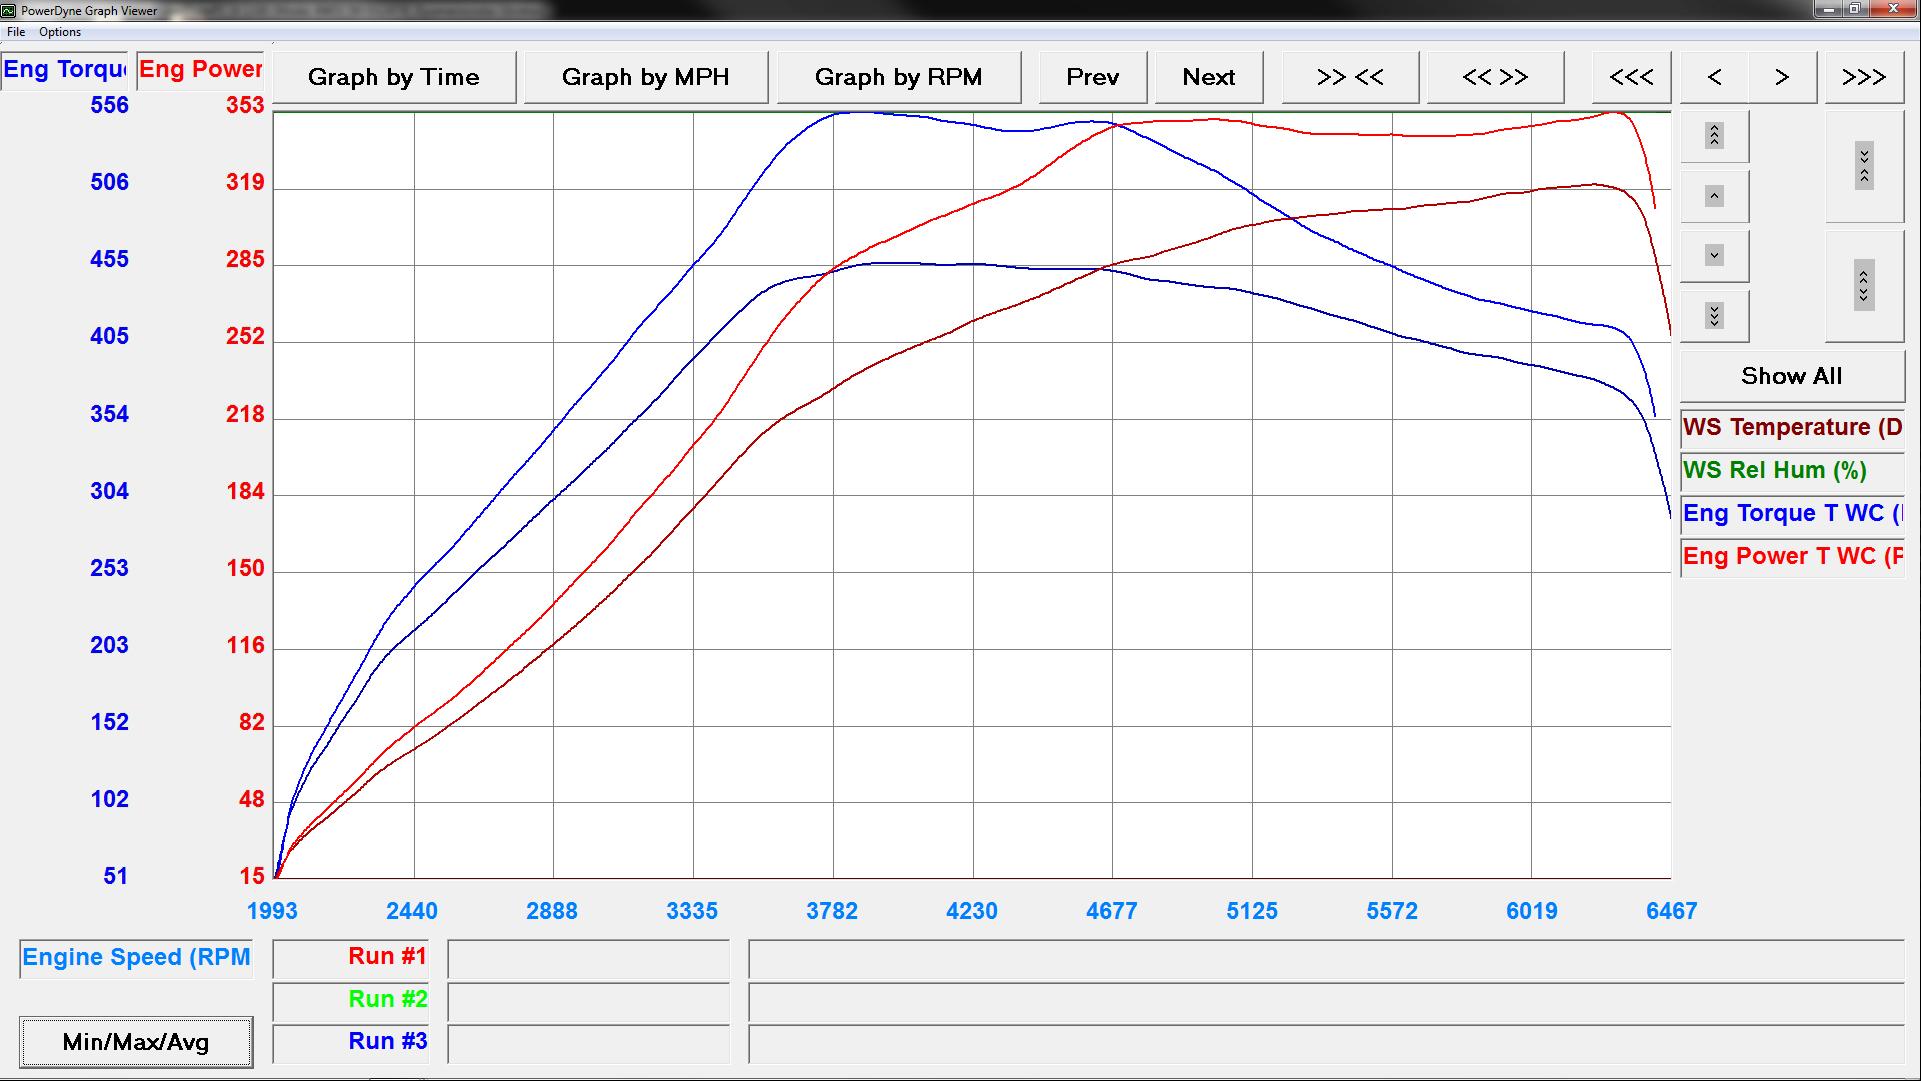 2008 Subaru Impreza Wrx Sti 353Ps stage 1 — GT-innovation